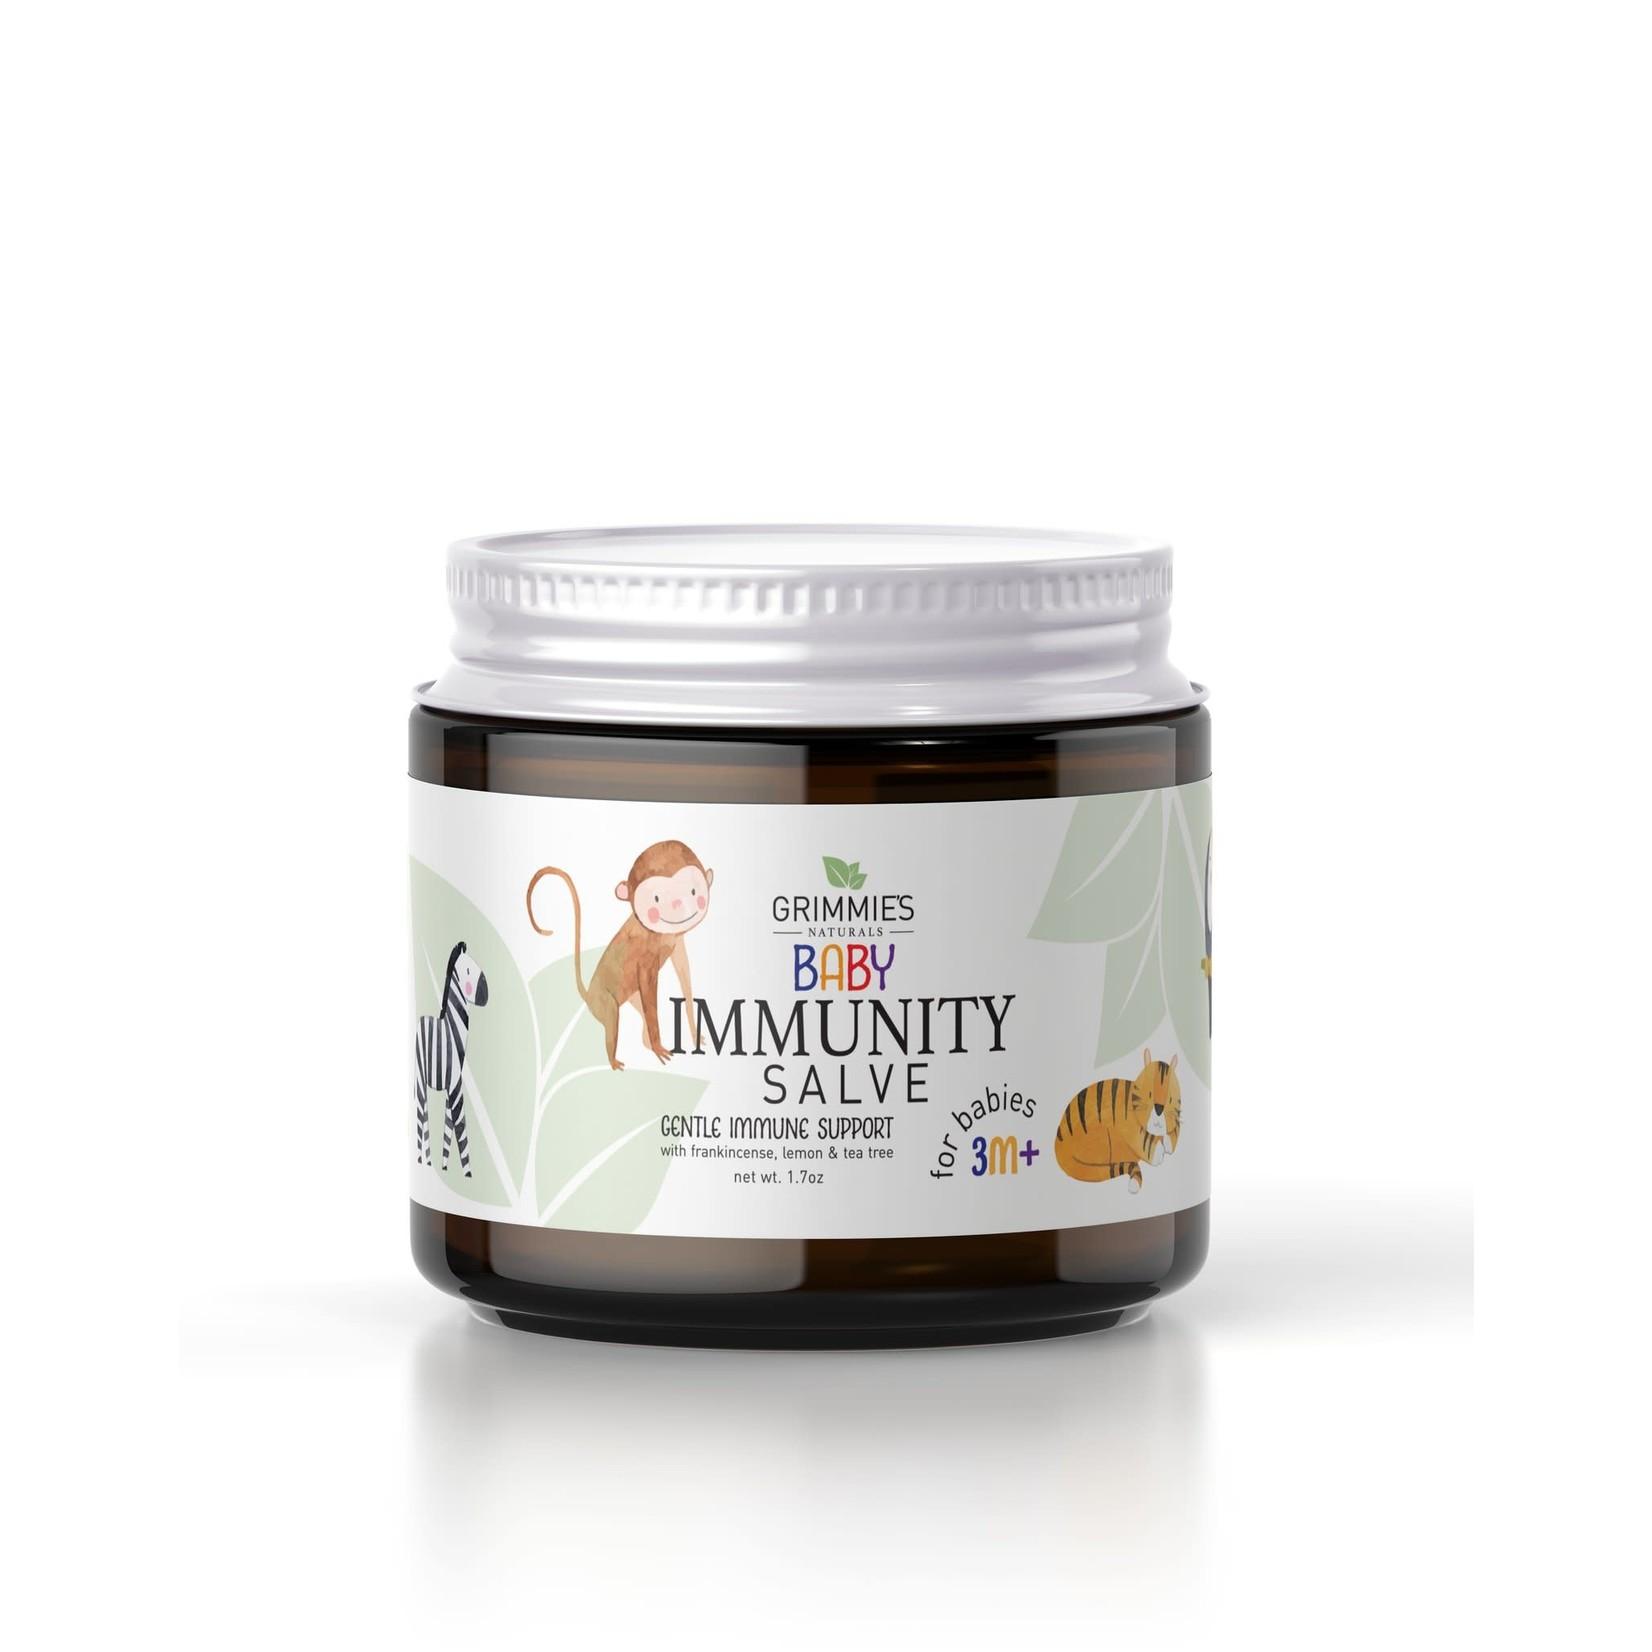 Grimmies Naturals Baby Immunity Salve